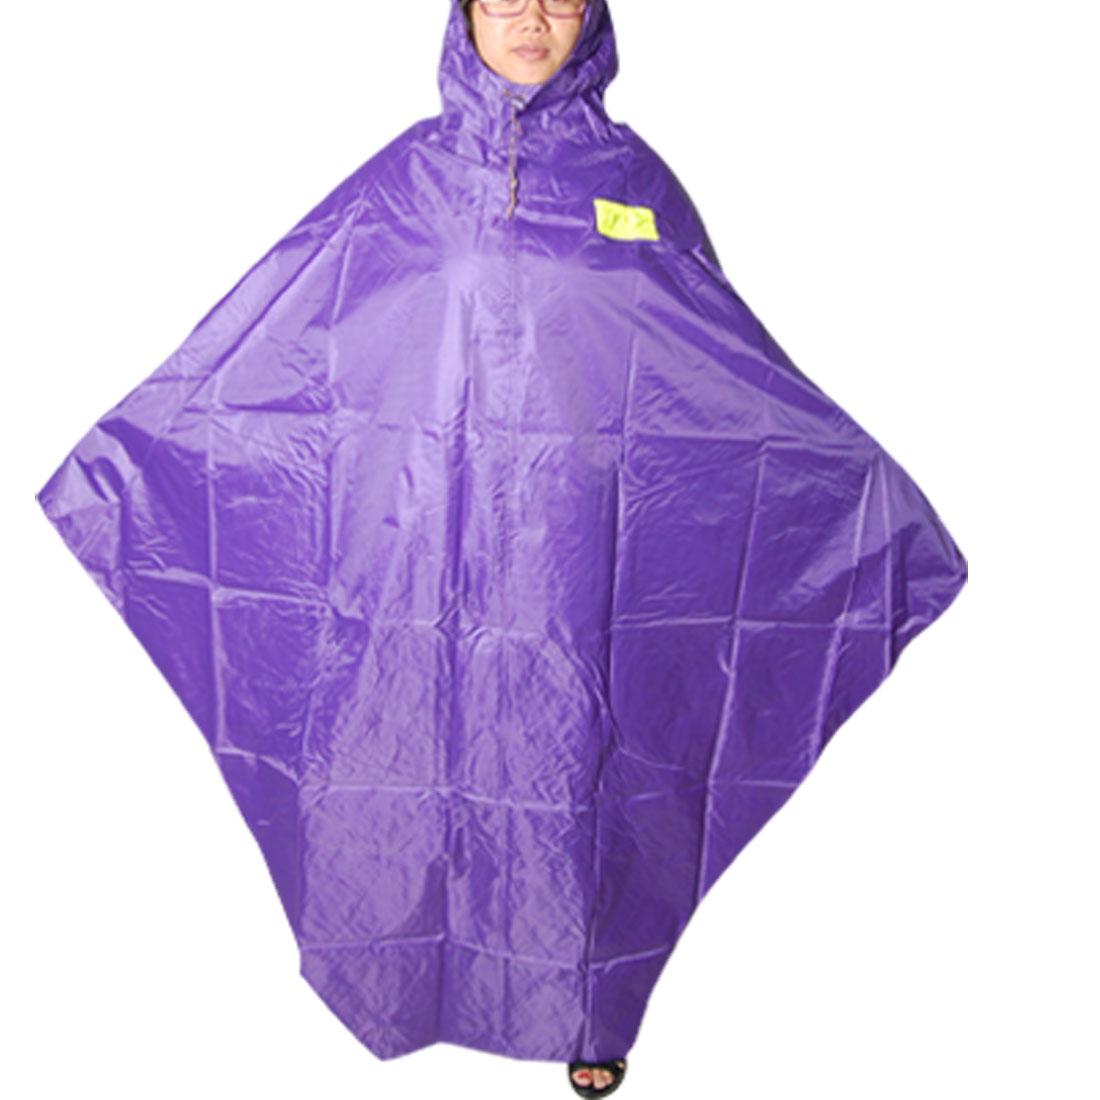 Bicycle Raincoat Seams Sealed Purple Hooded Rain Poncho